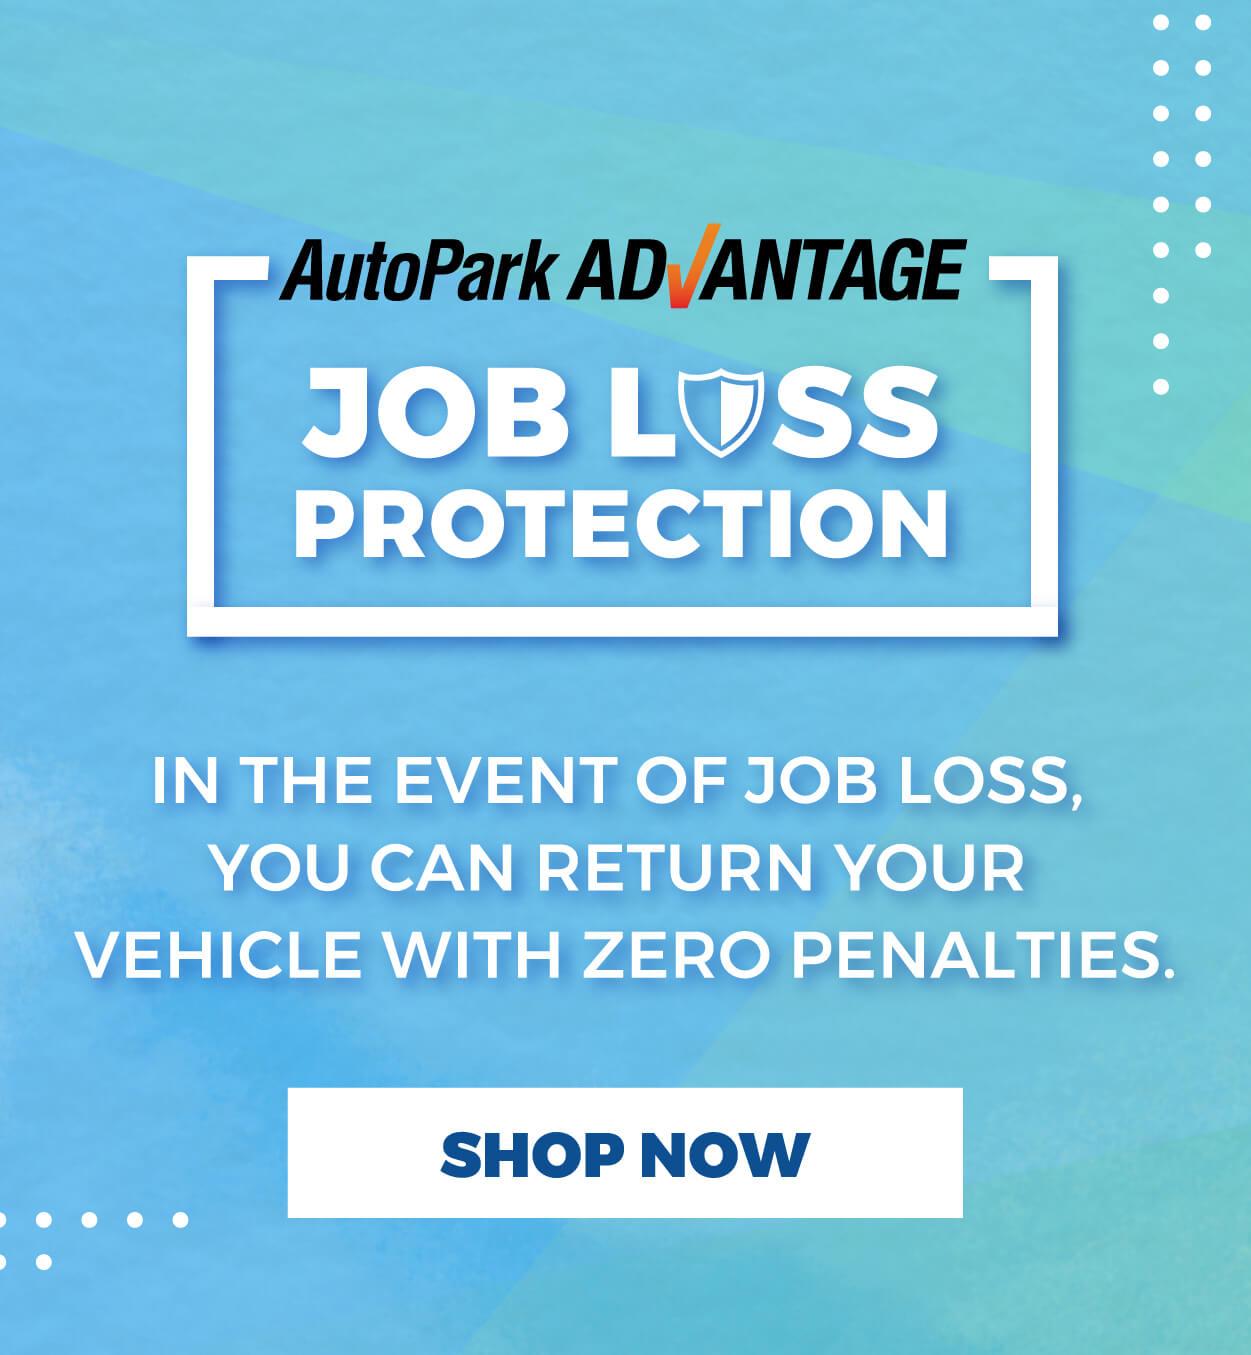 AutoPark - Job Loss Protection